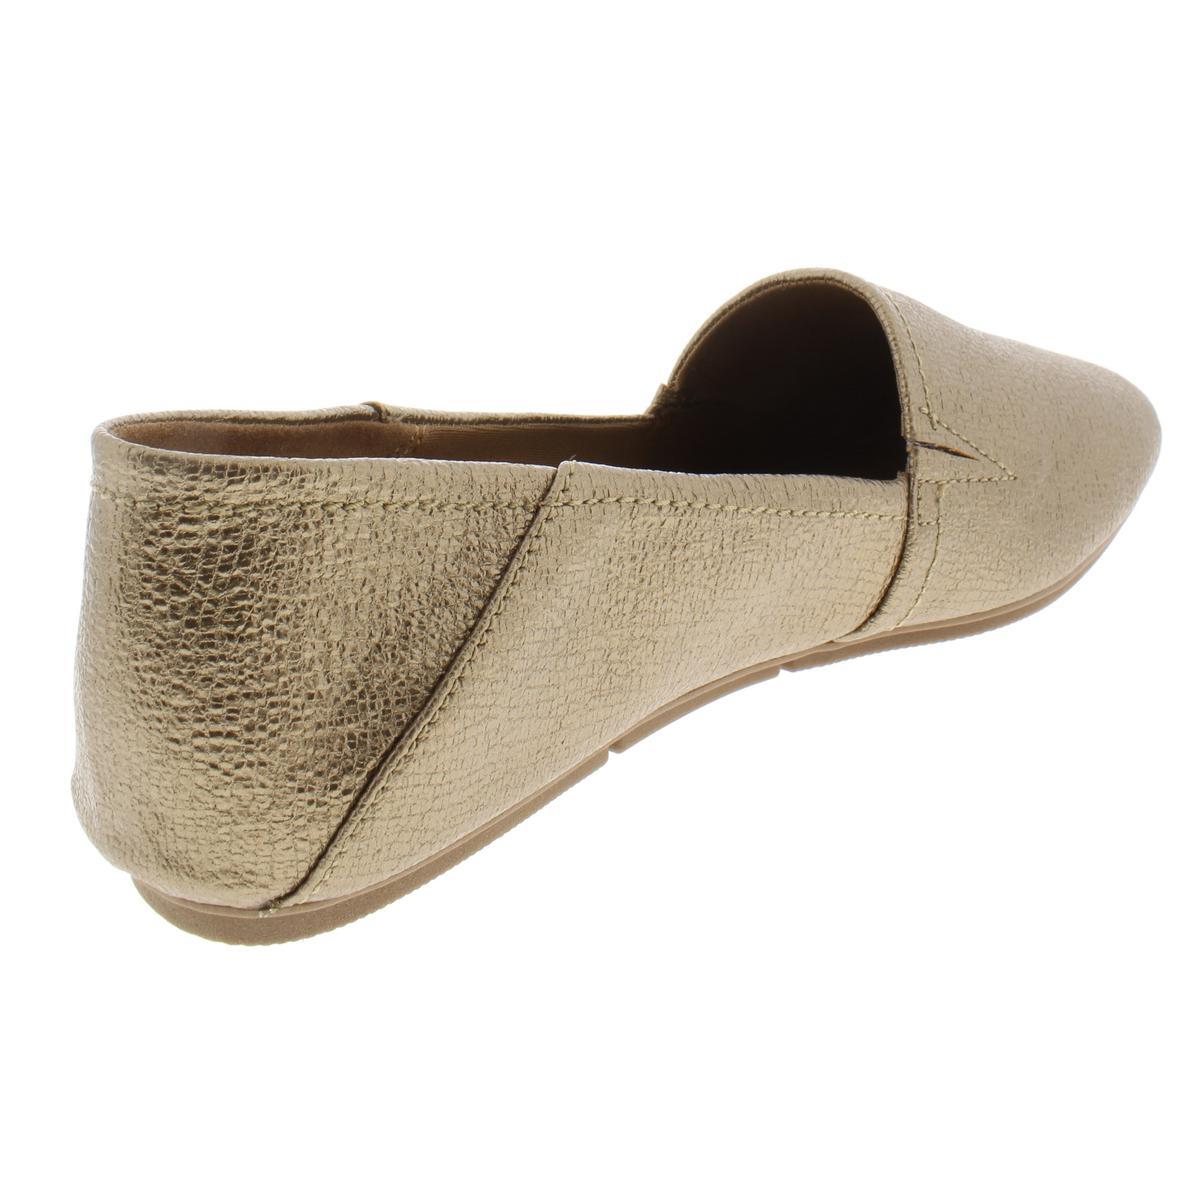 Style-amp-Co-Womens-Nixine-Slip-On-Flats-Casual-Shoes-Shoes-BHFO-6071 thumbnail 8